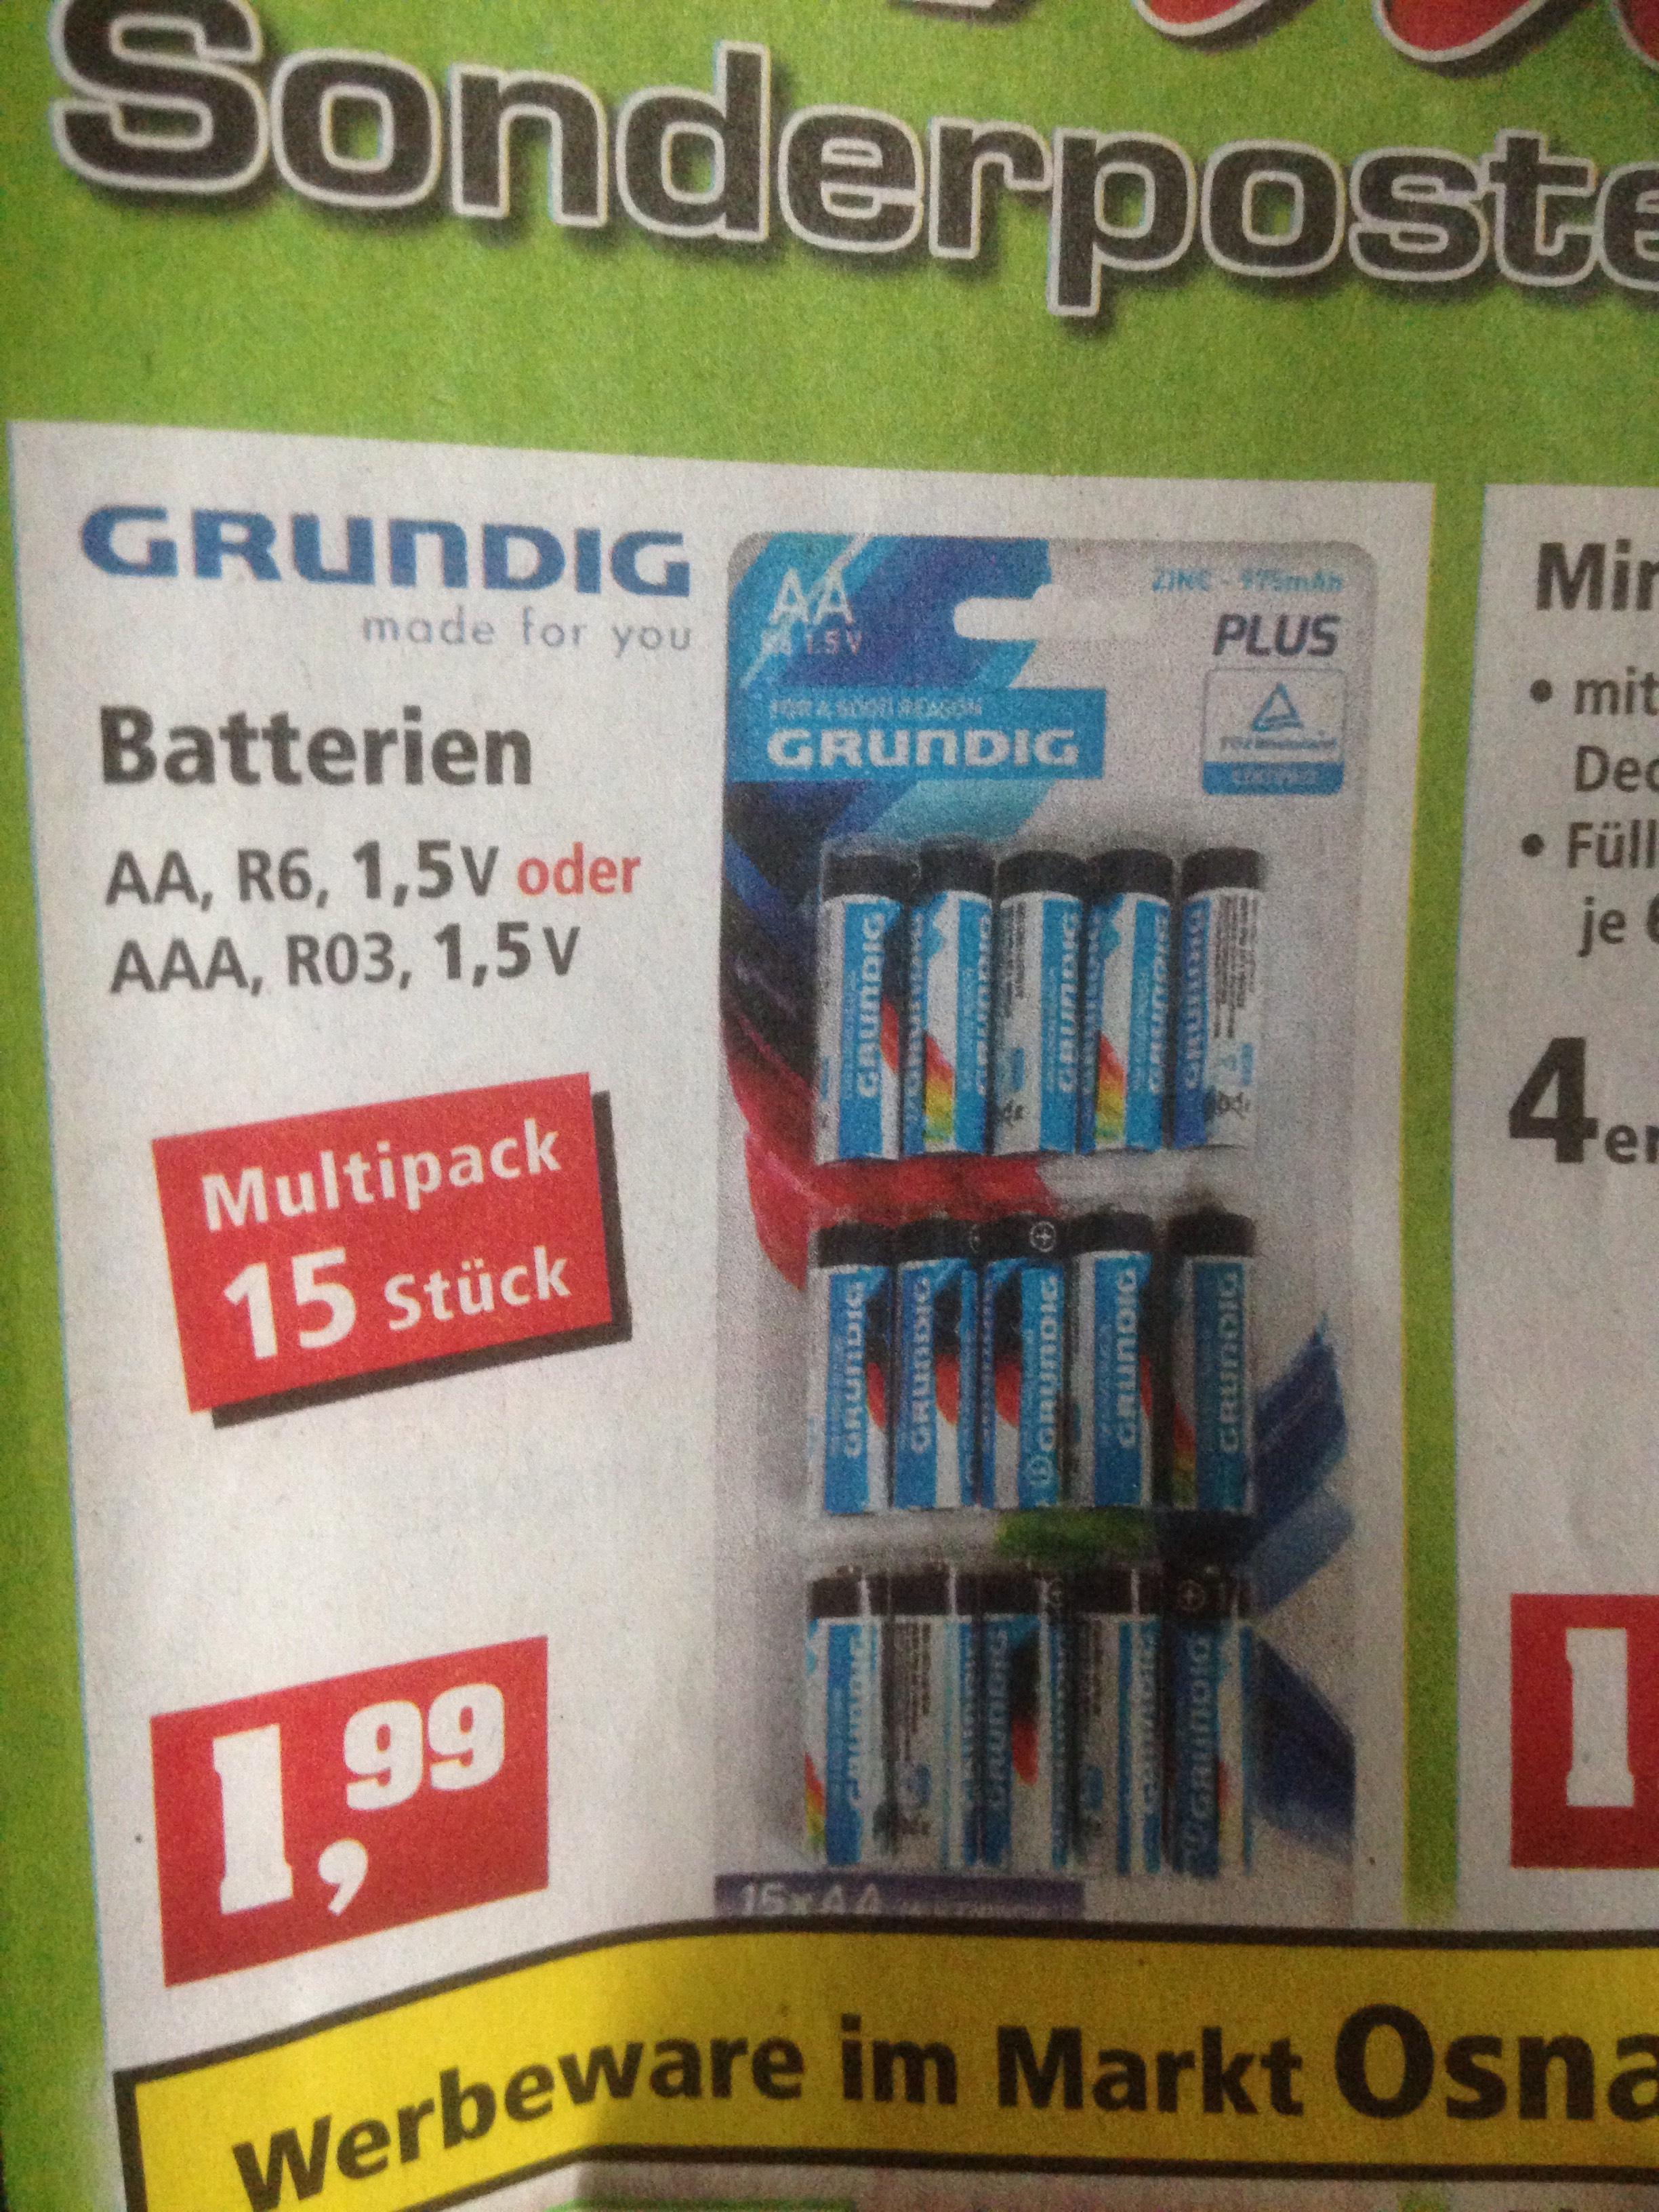 Thomas Philipps 15 Grundig AA oder AAA Batterien für 1,99. 25 KG Buntkies 1,99€